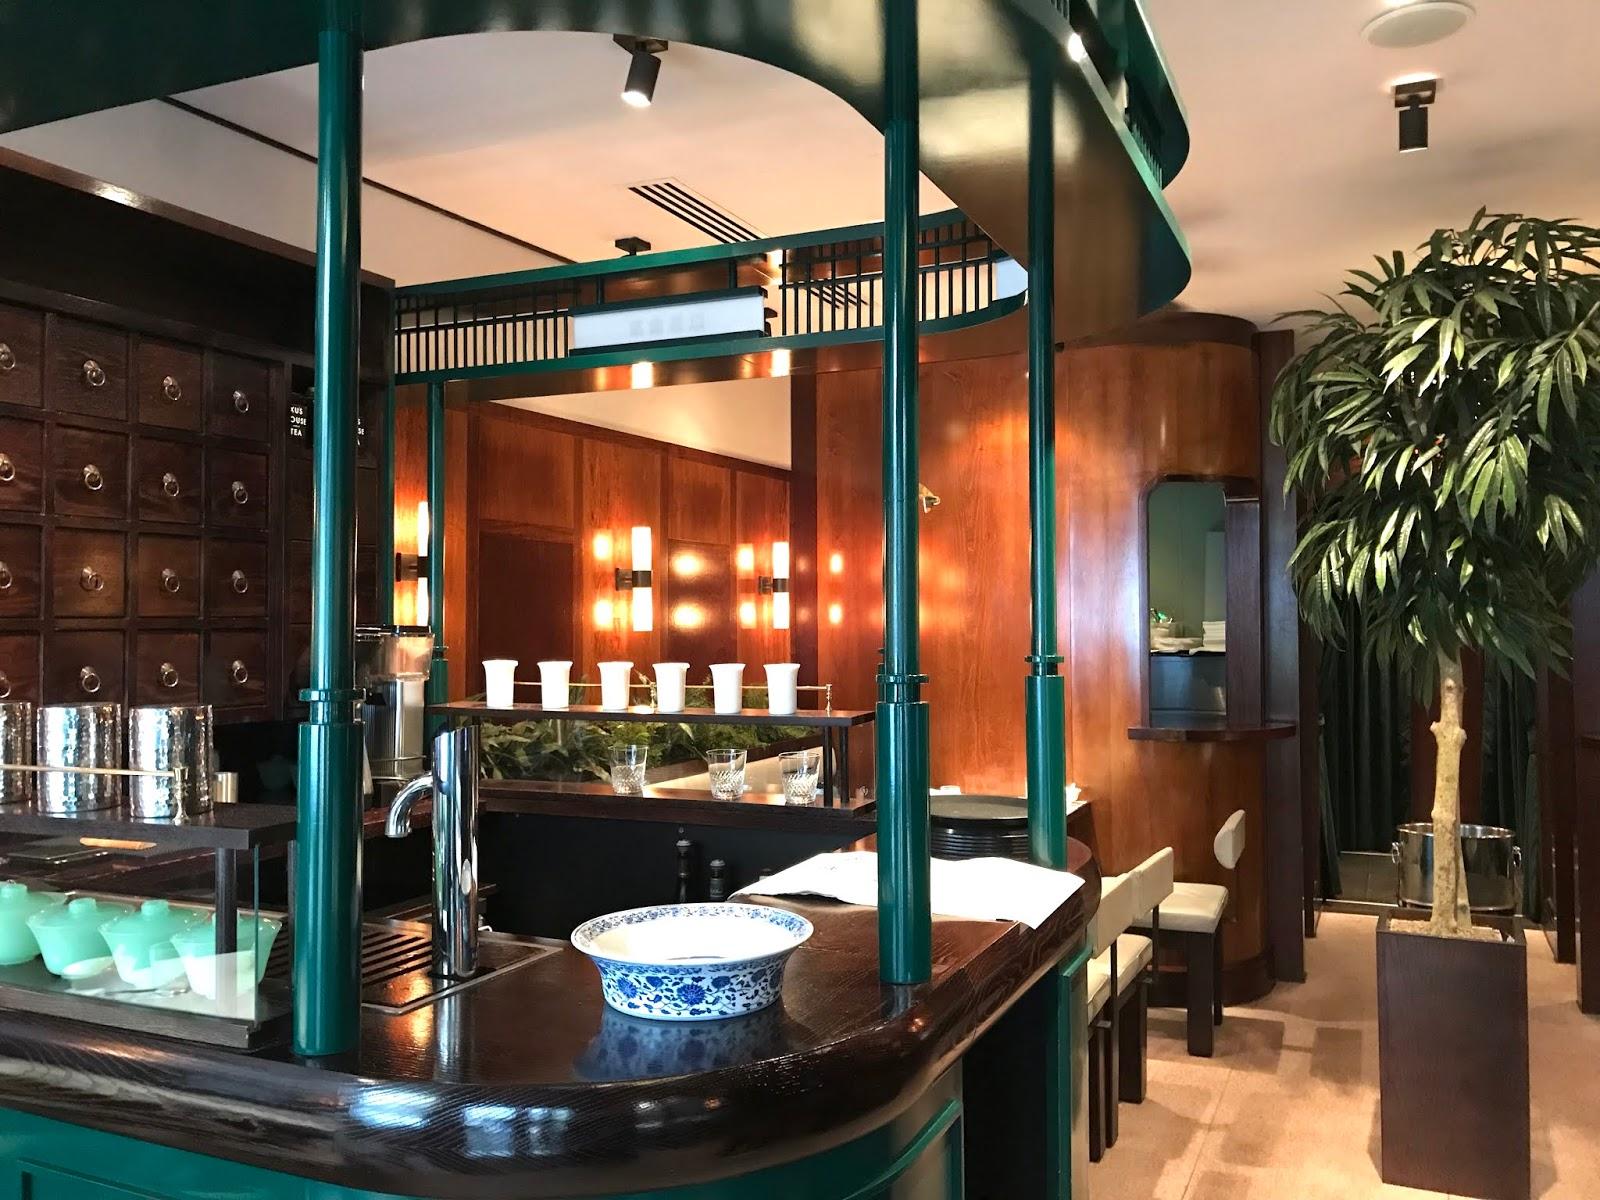 xu-teahouse-london